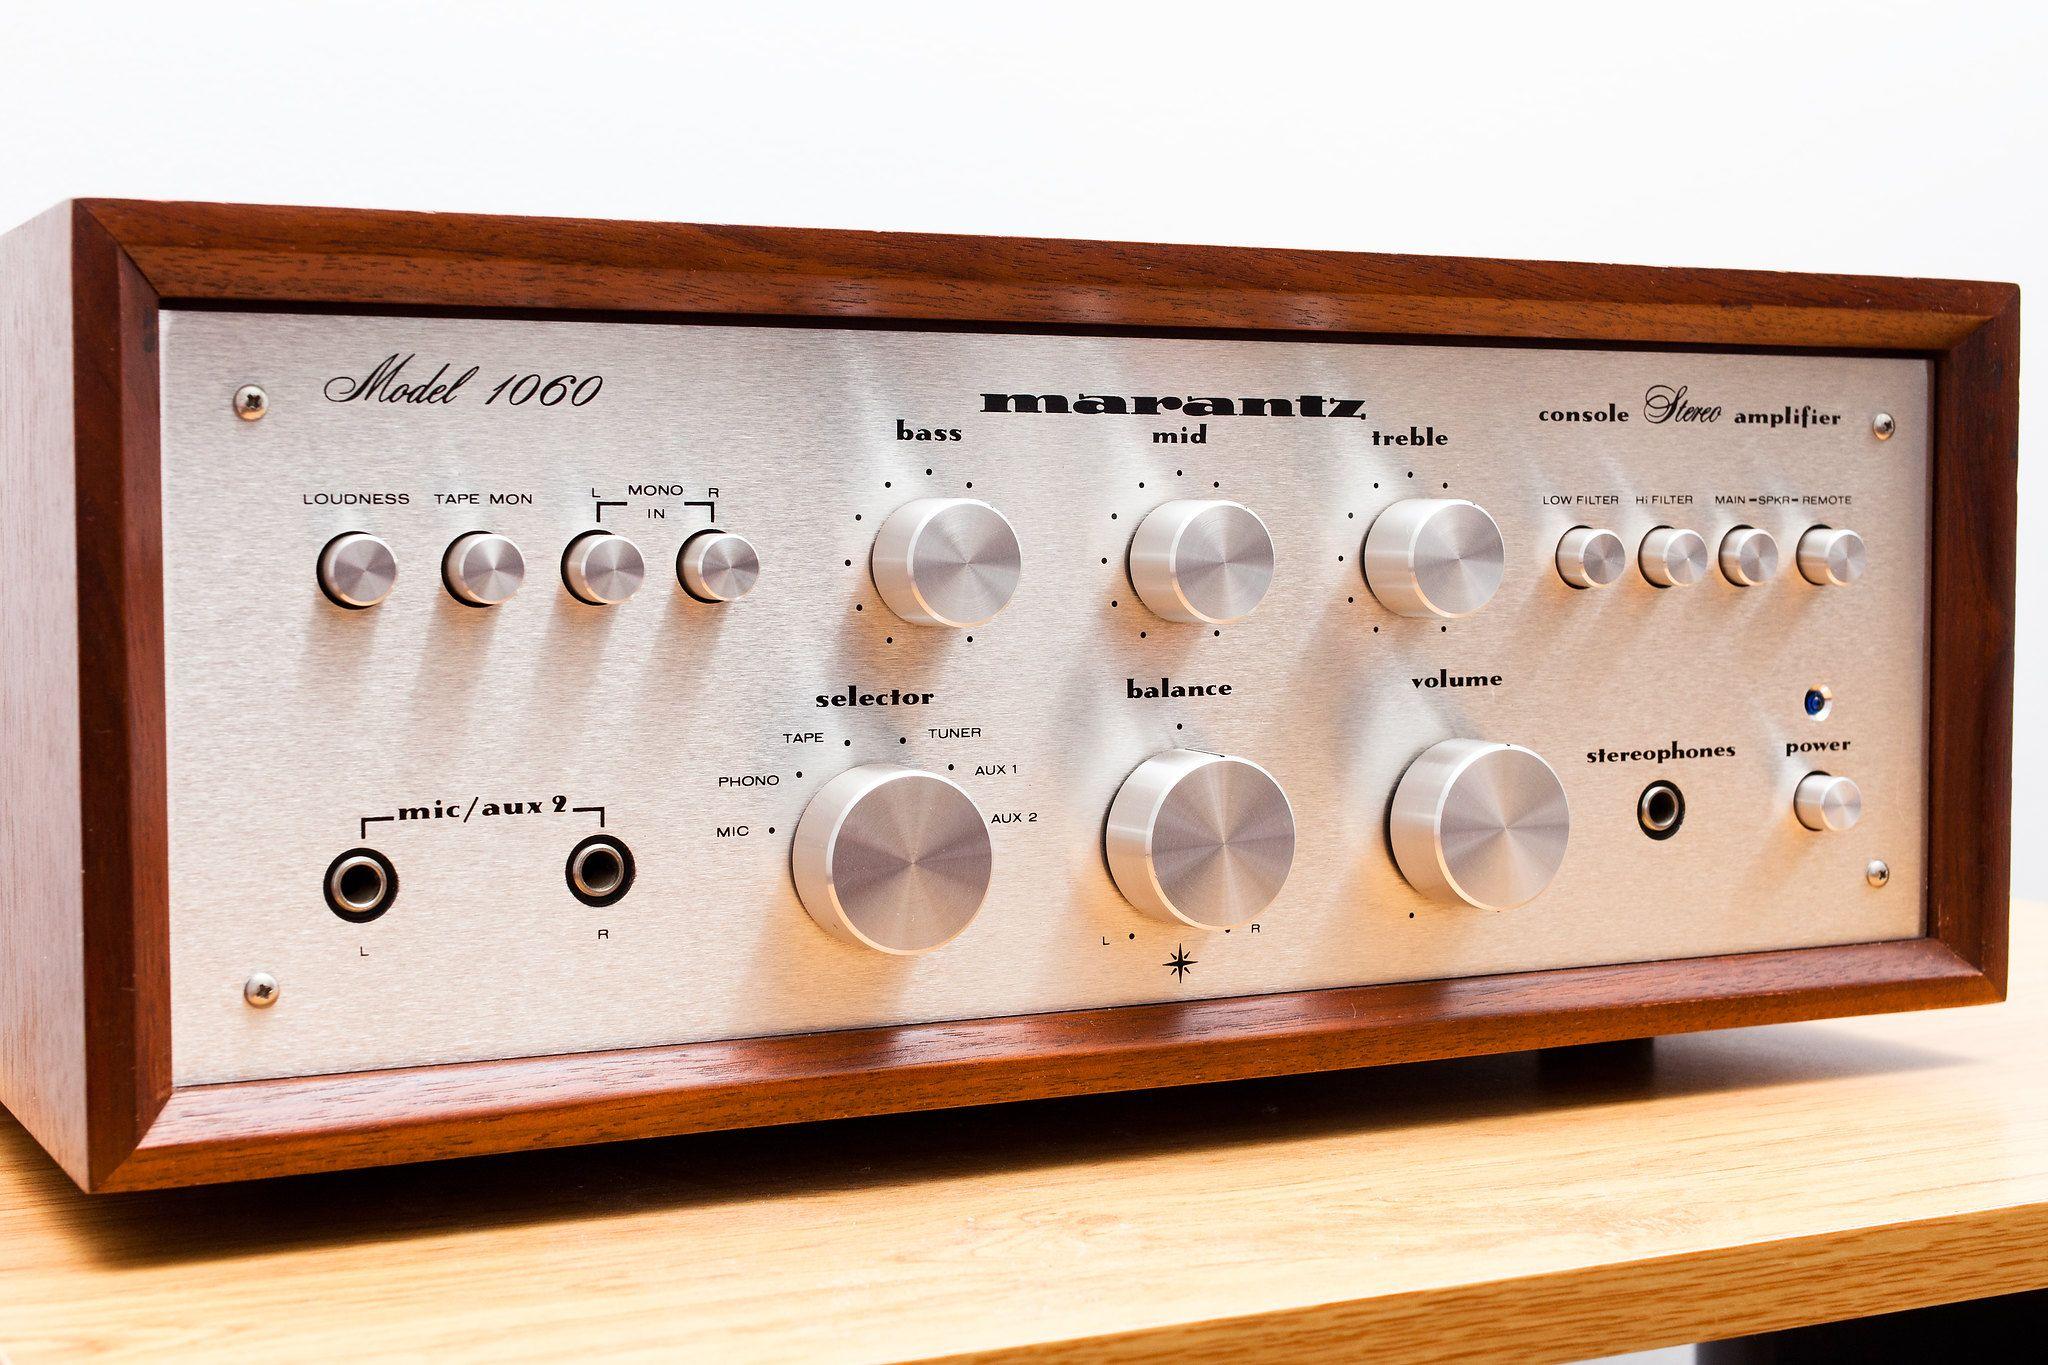 Marantz 1060 Stereo Integrated Amplifier Marantz Audio Stereo Amp